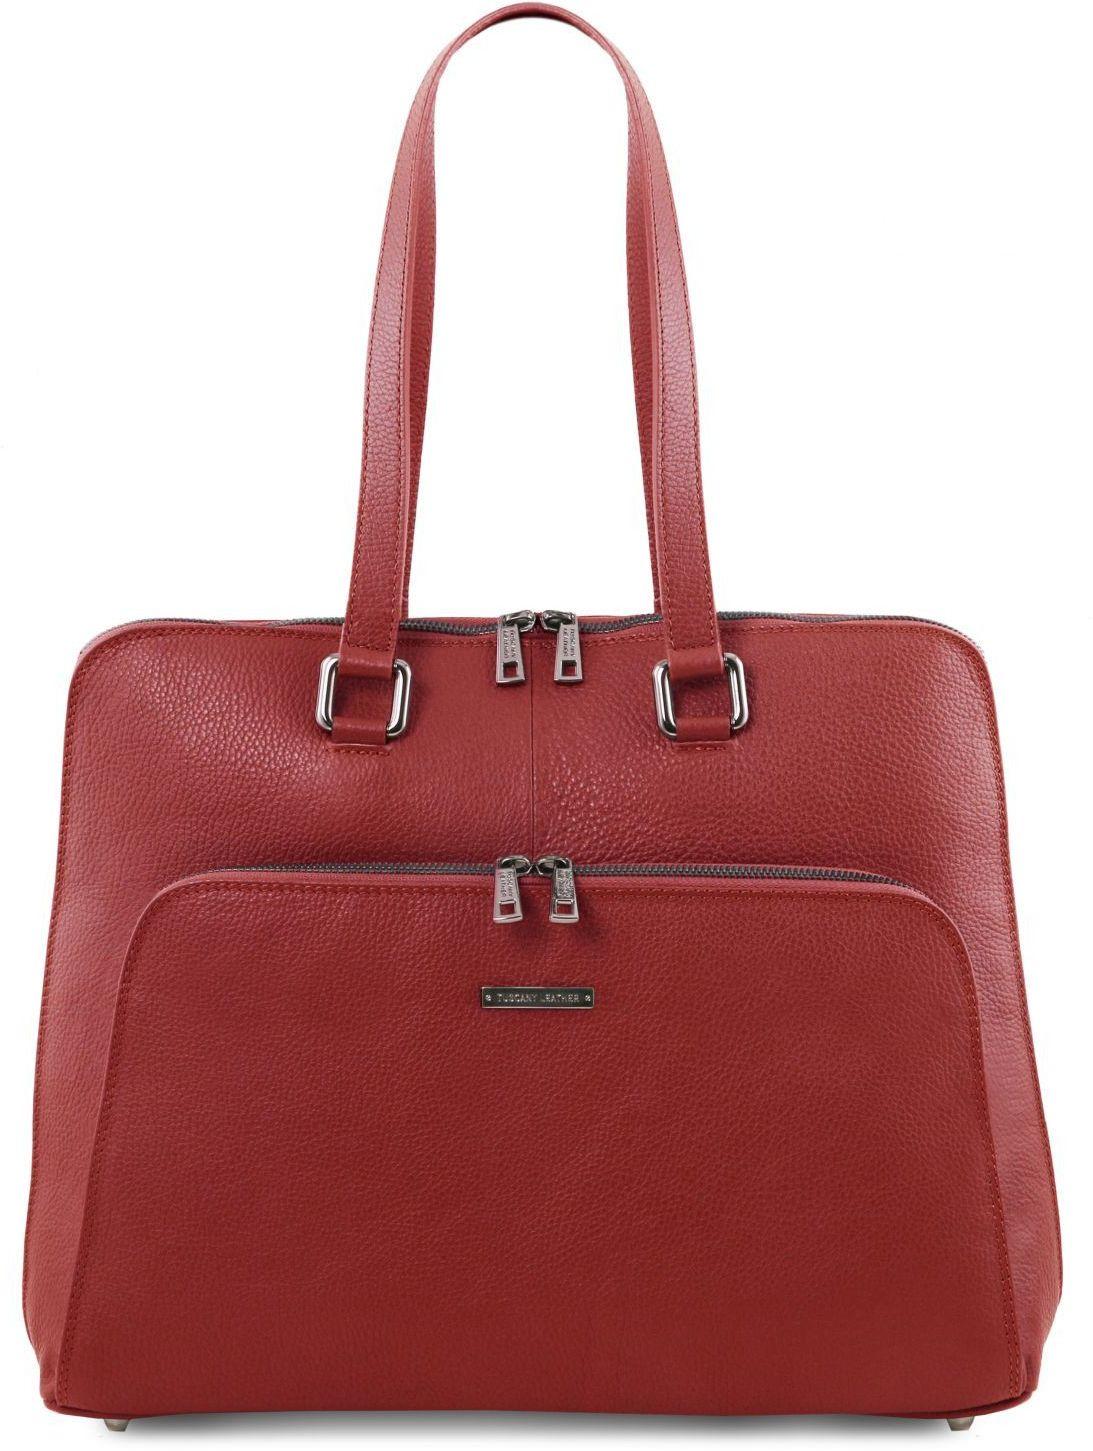 edefa38e93 Γυναικεία Επαγγελματική Τσάντα Δερμάτινη Lucca Κόκκινο Tuscany Leather ...